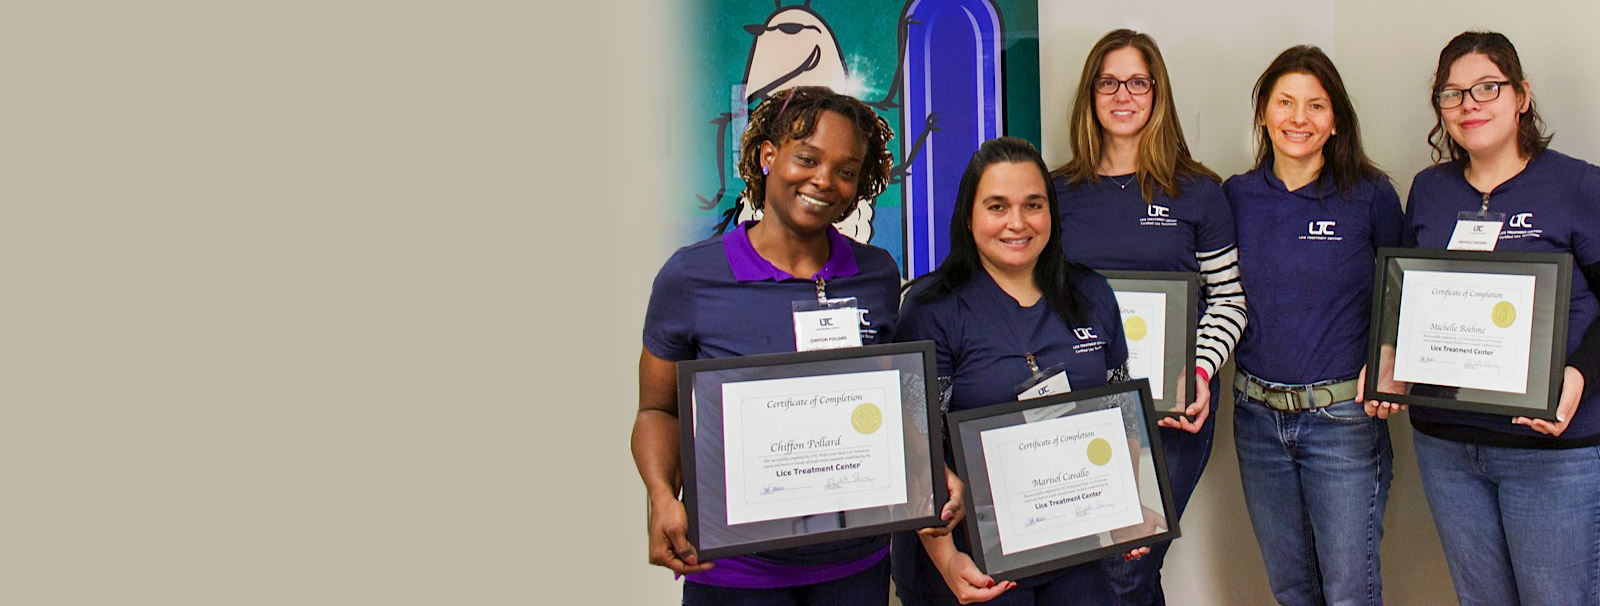 Certified Lice Technician Training Program Dec. 3 & 4, 2015